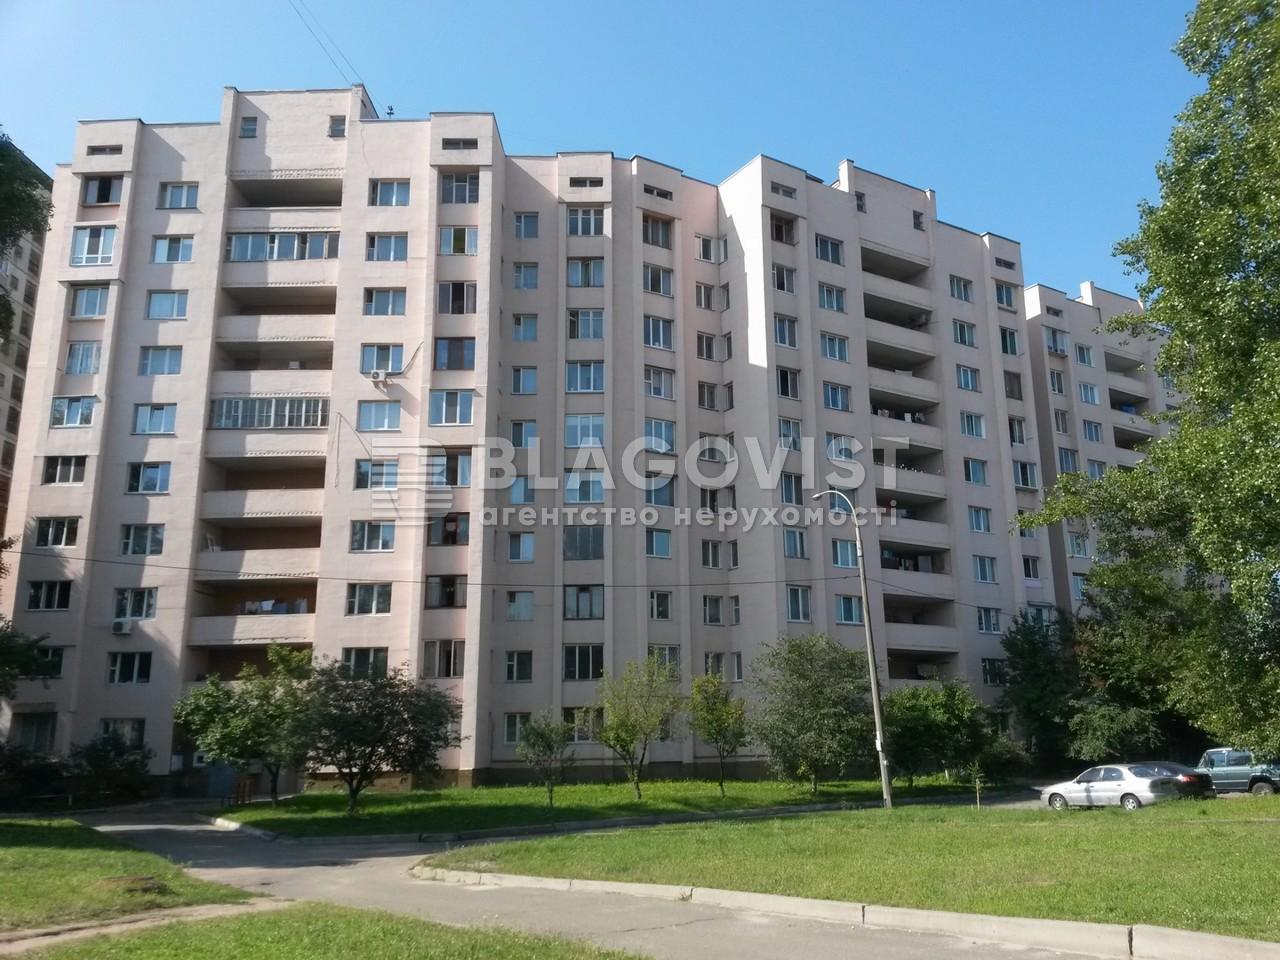 Дом Z-56191, Радужная, Киев - Фото 4